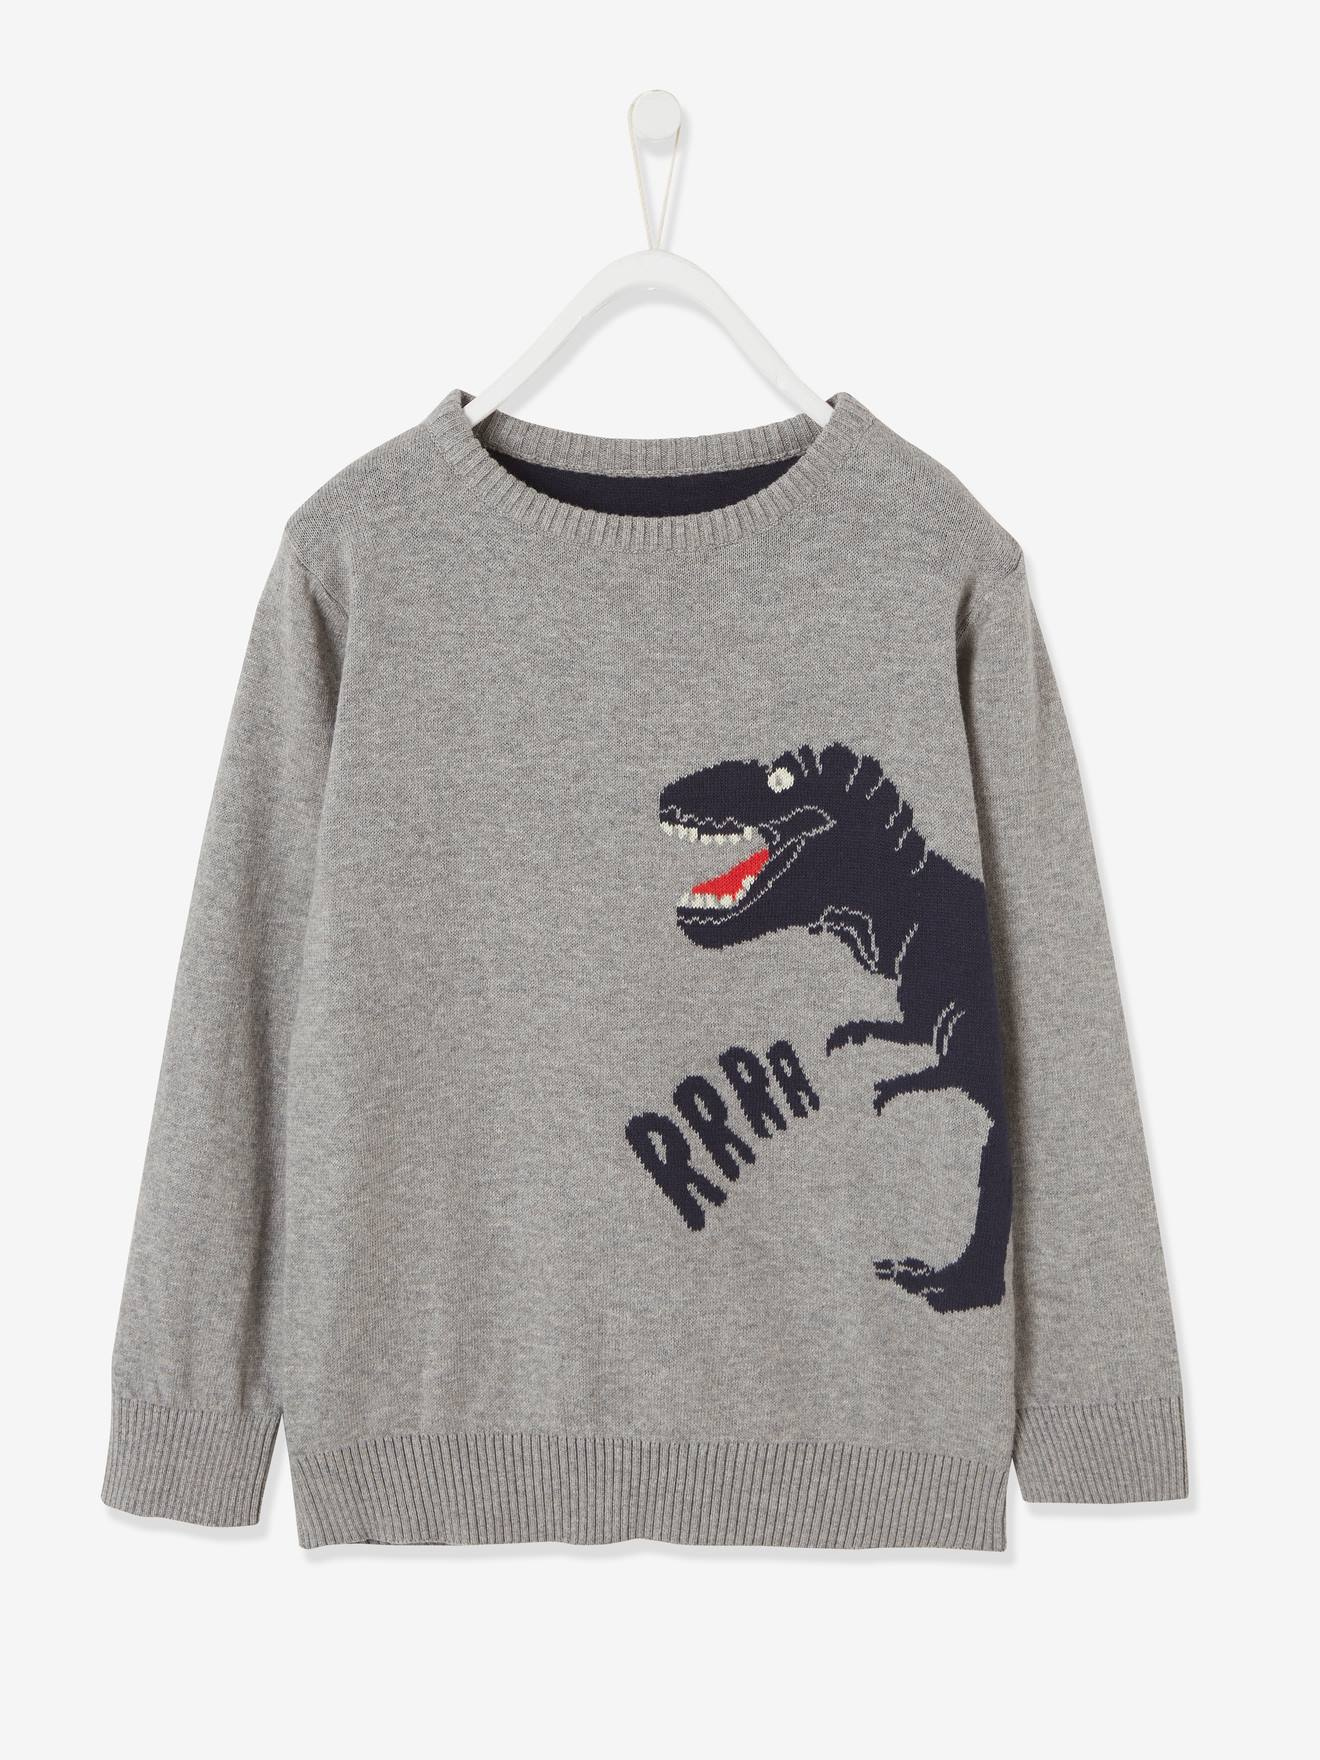 Pull jacquard garçon motif ludique Oeko-Tex® gris chiné